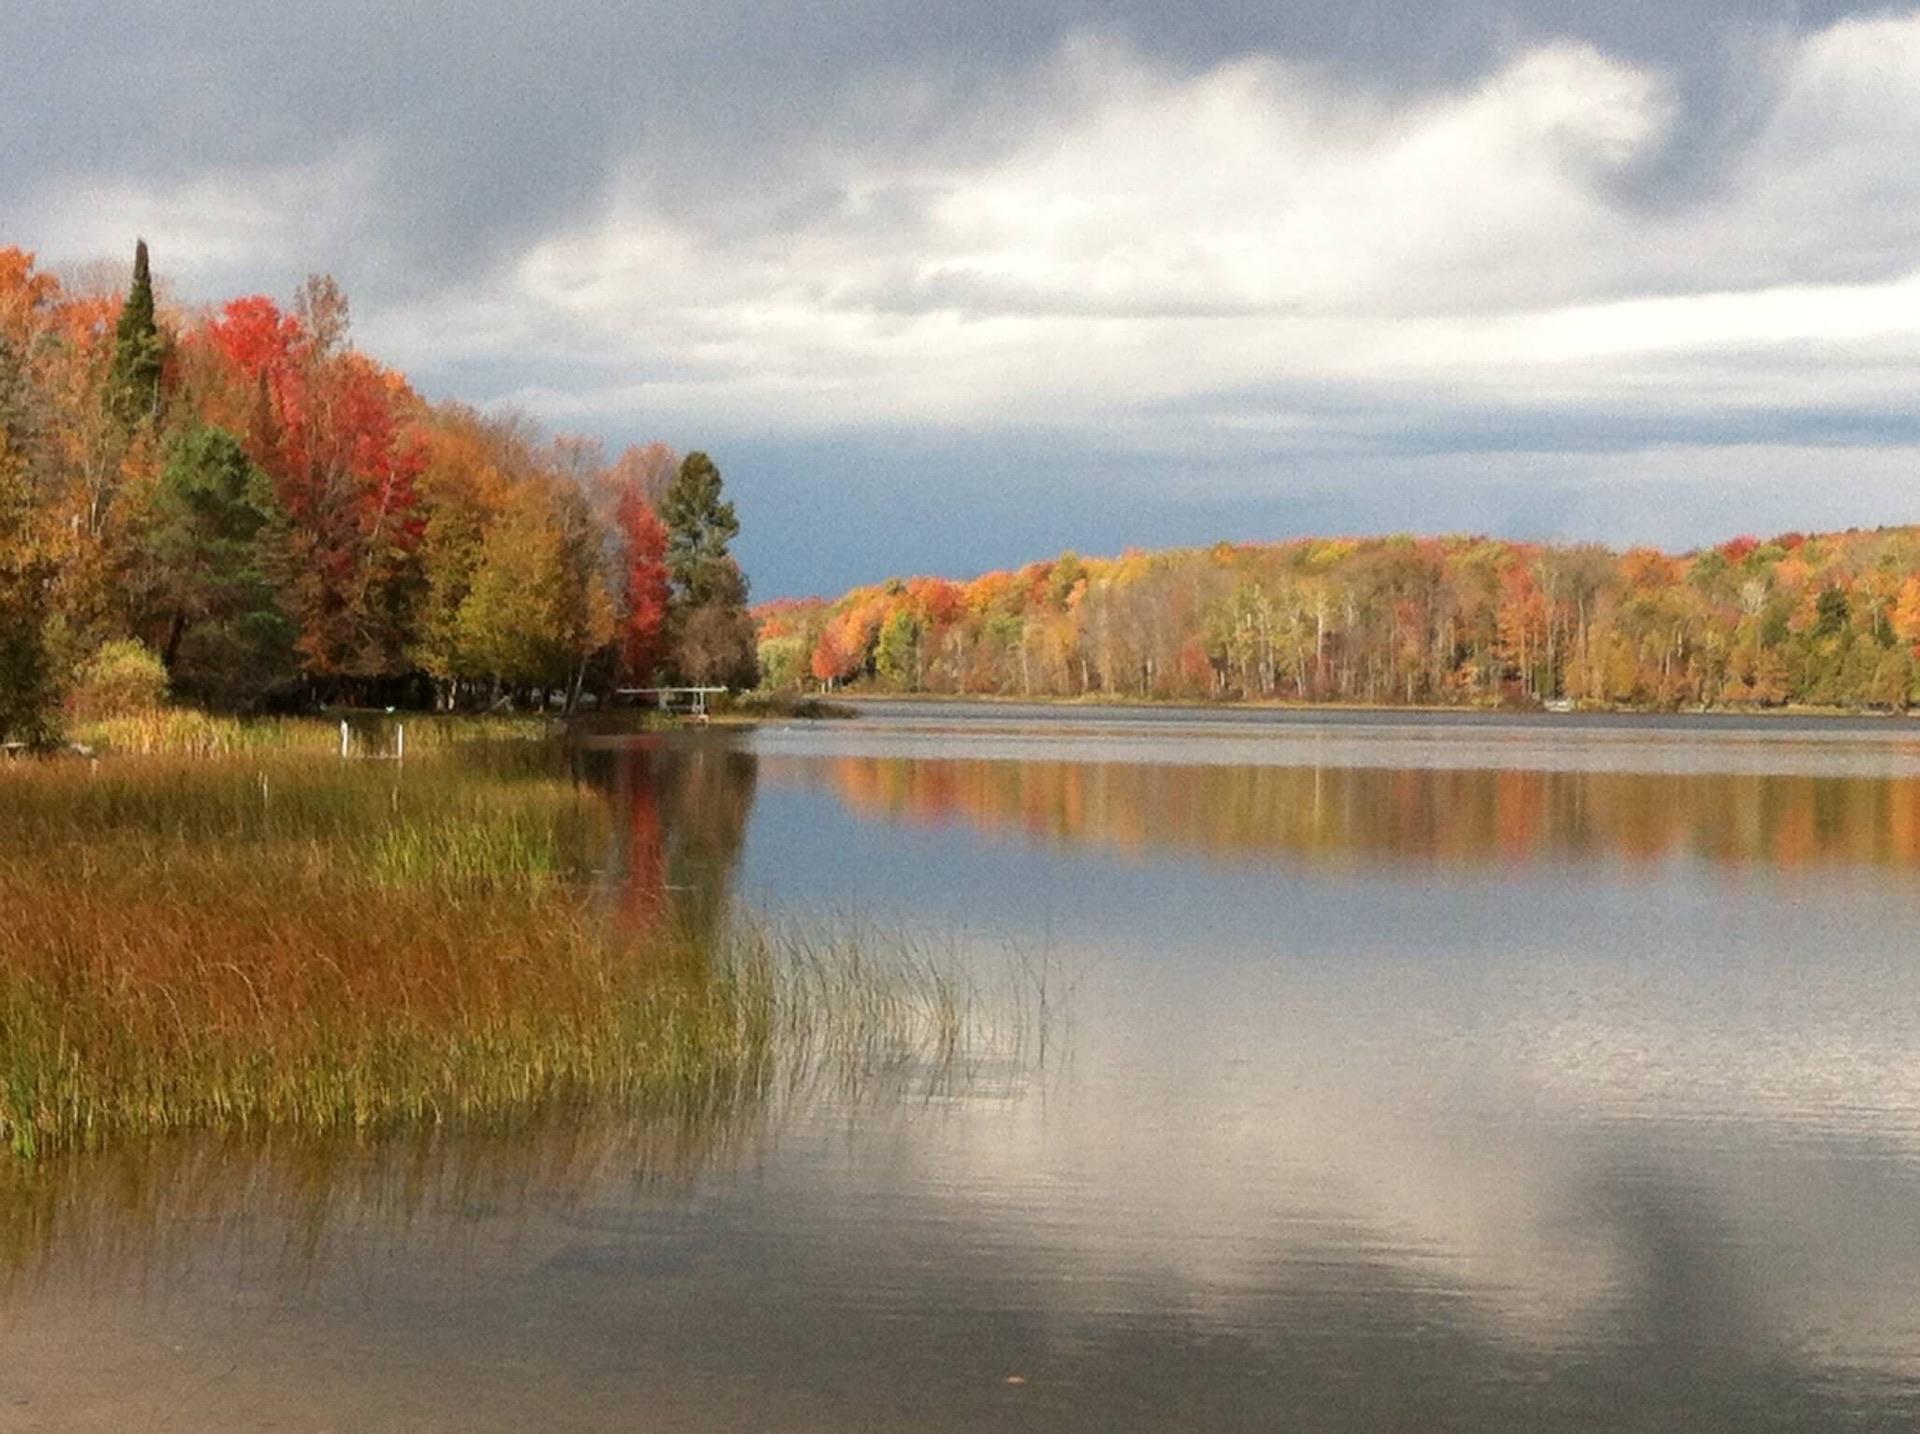 For an autumn adventure in Michigan, visit Torch Lake in its fall colors, close to Bridgewalk B&B